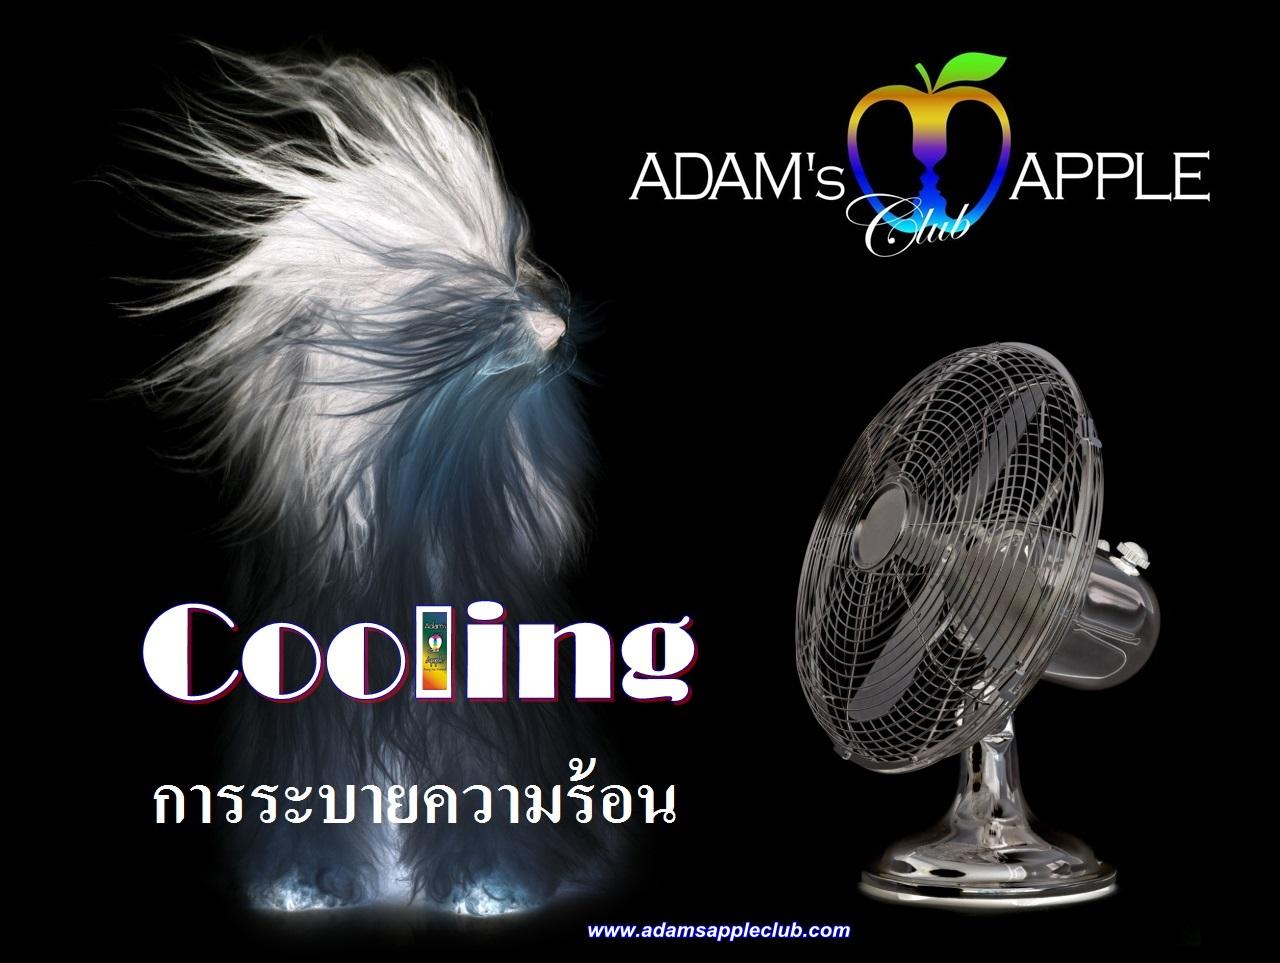 Stay Cool Adams Apple Club